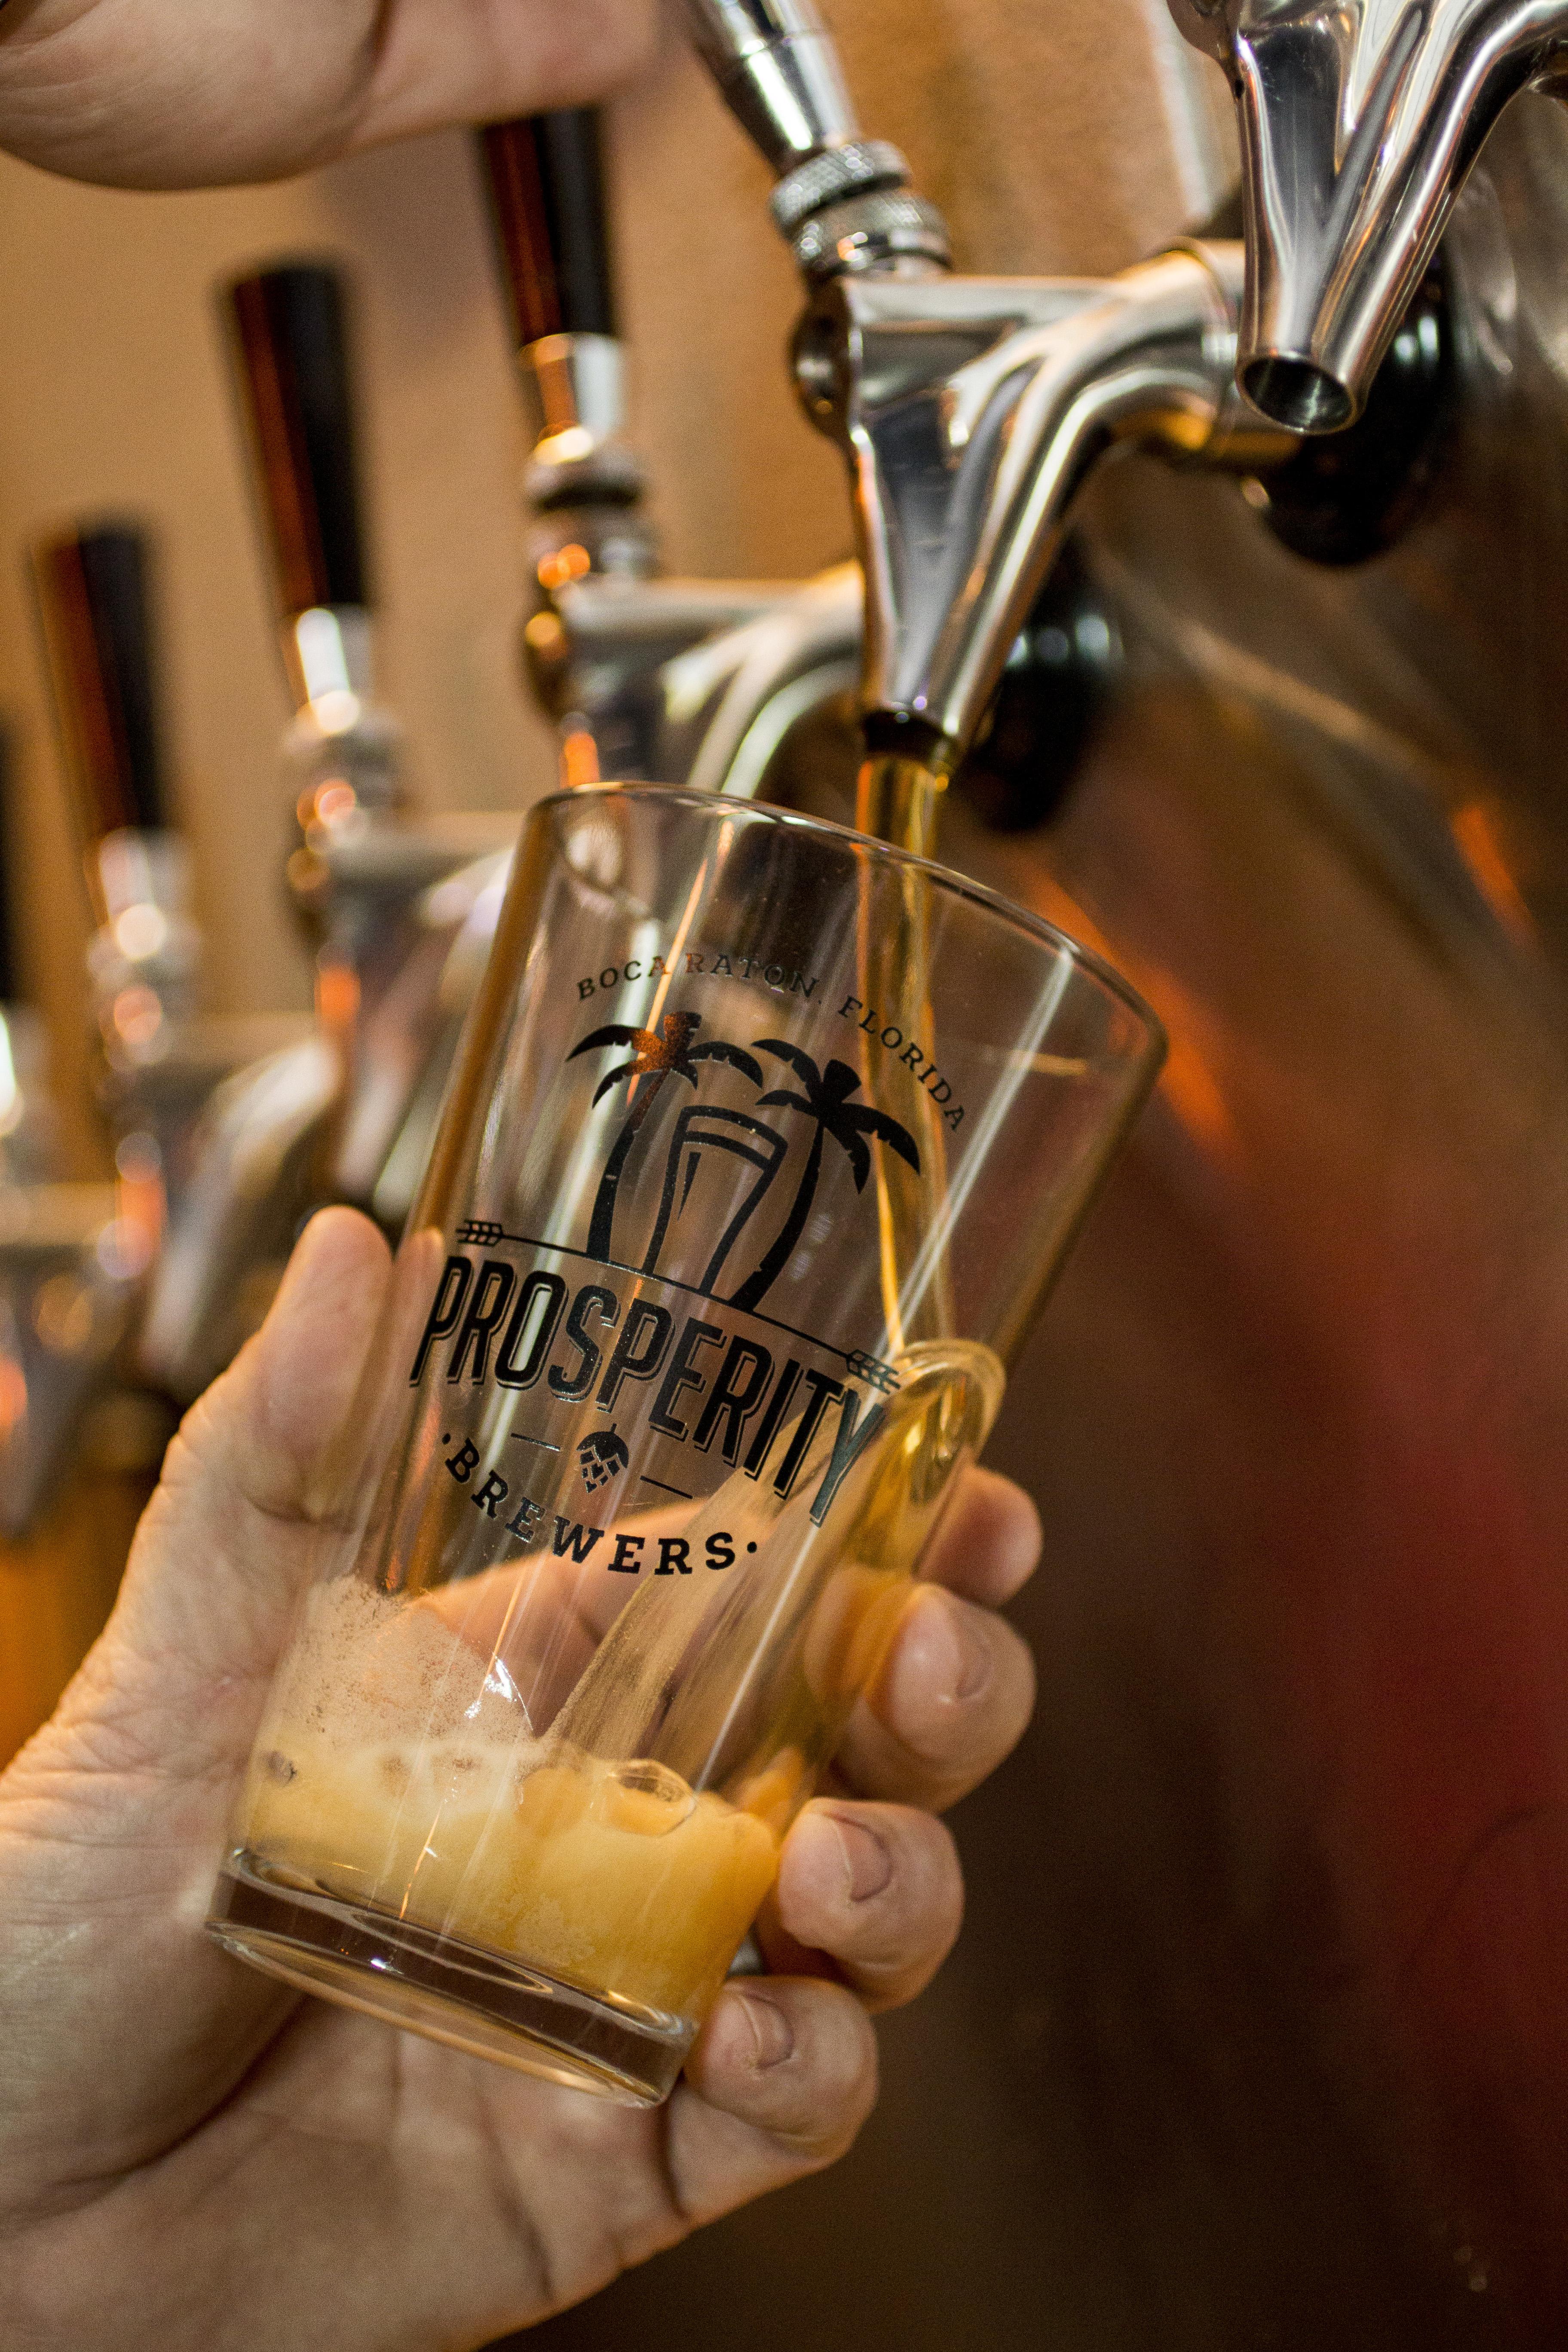 Best Beers From Prosperity Brewers in Boca Raton